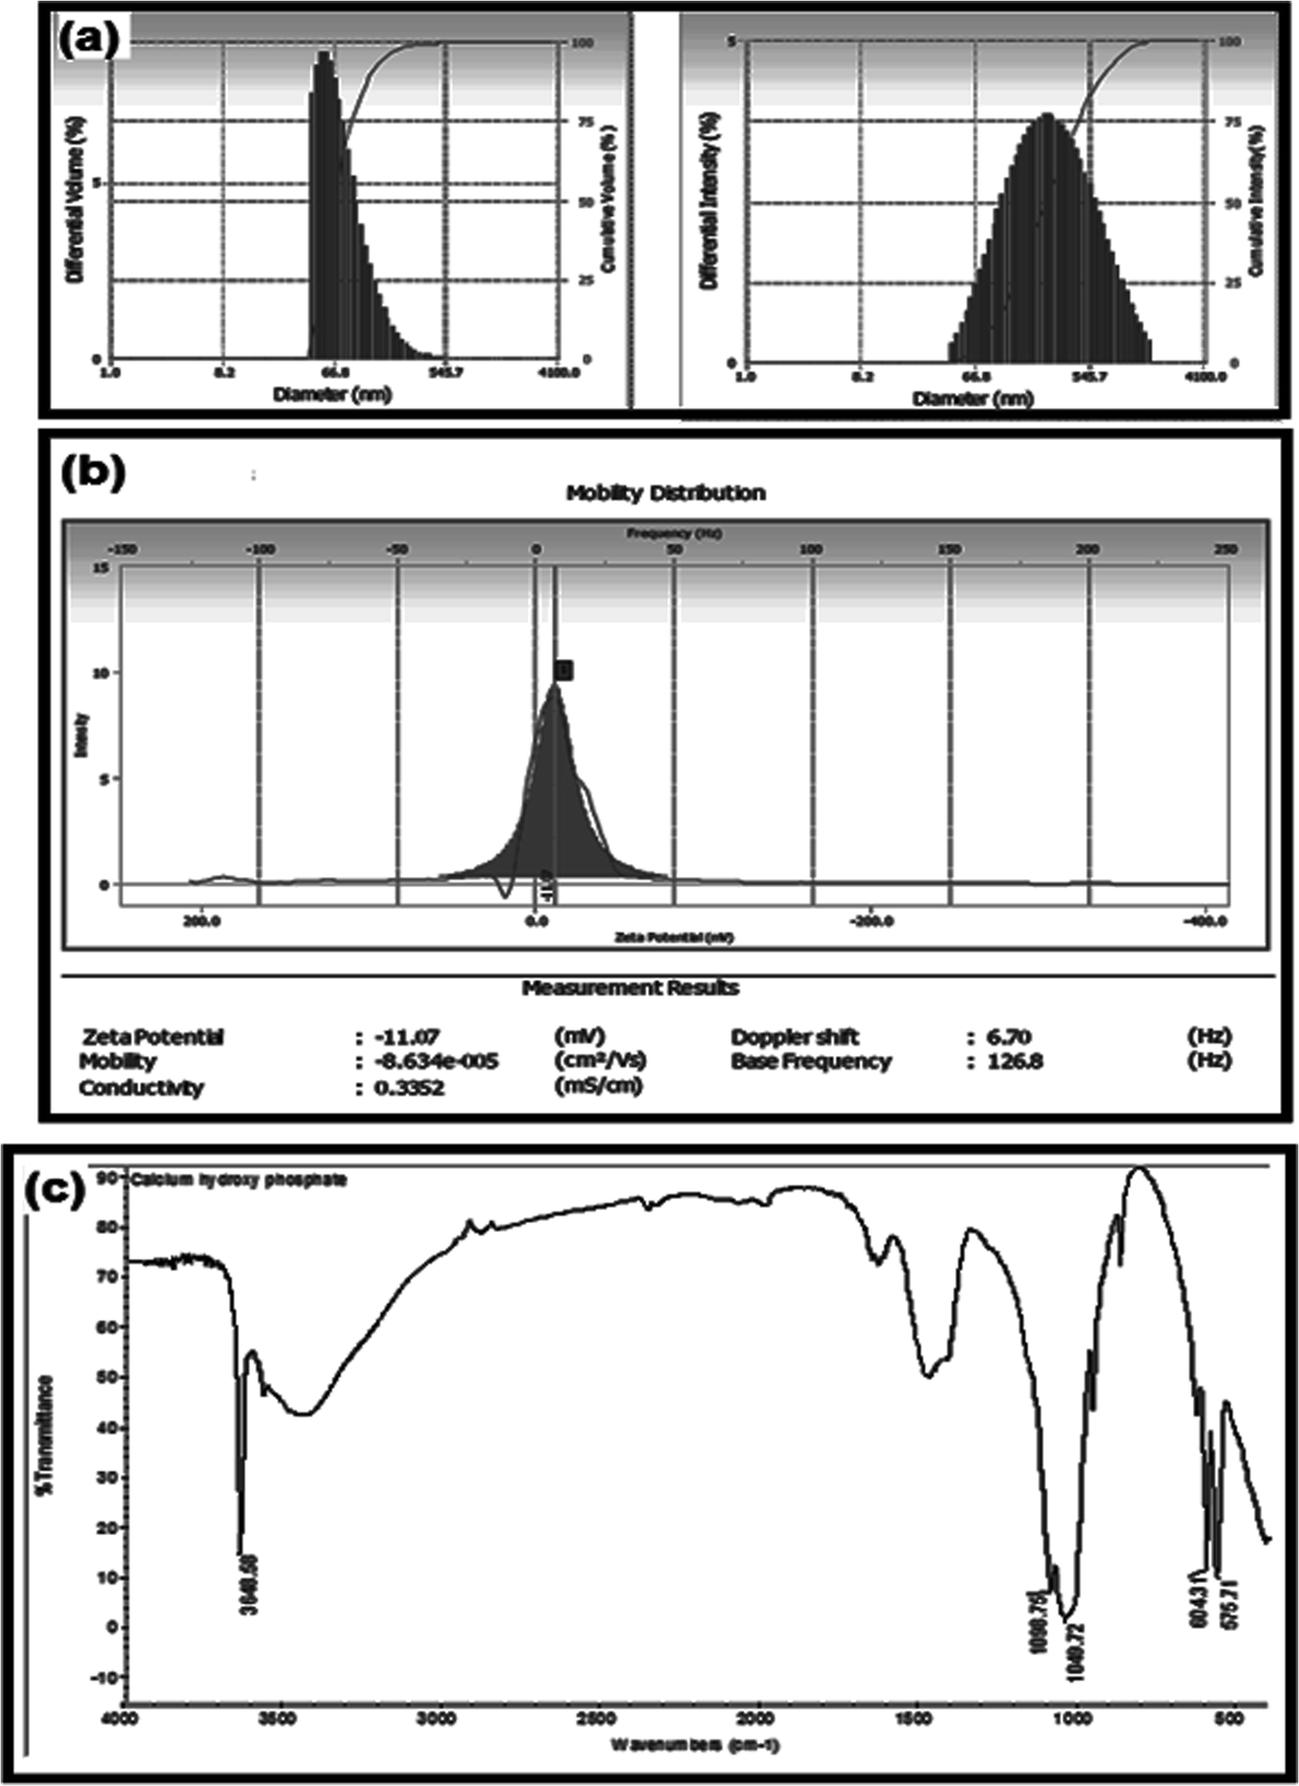 Development and Characterization of Novel Medicated Nanofiber for